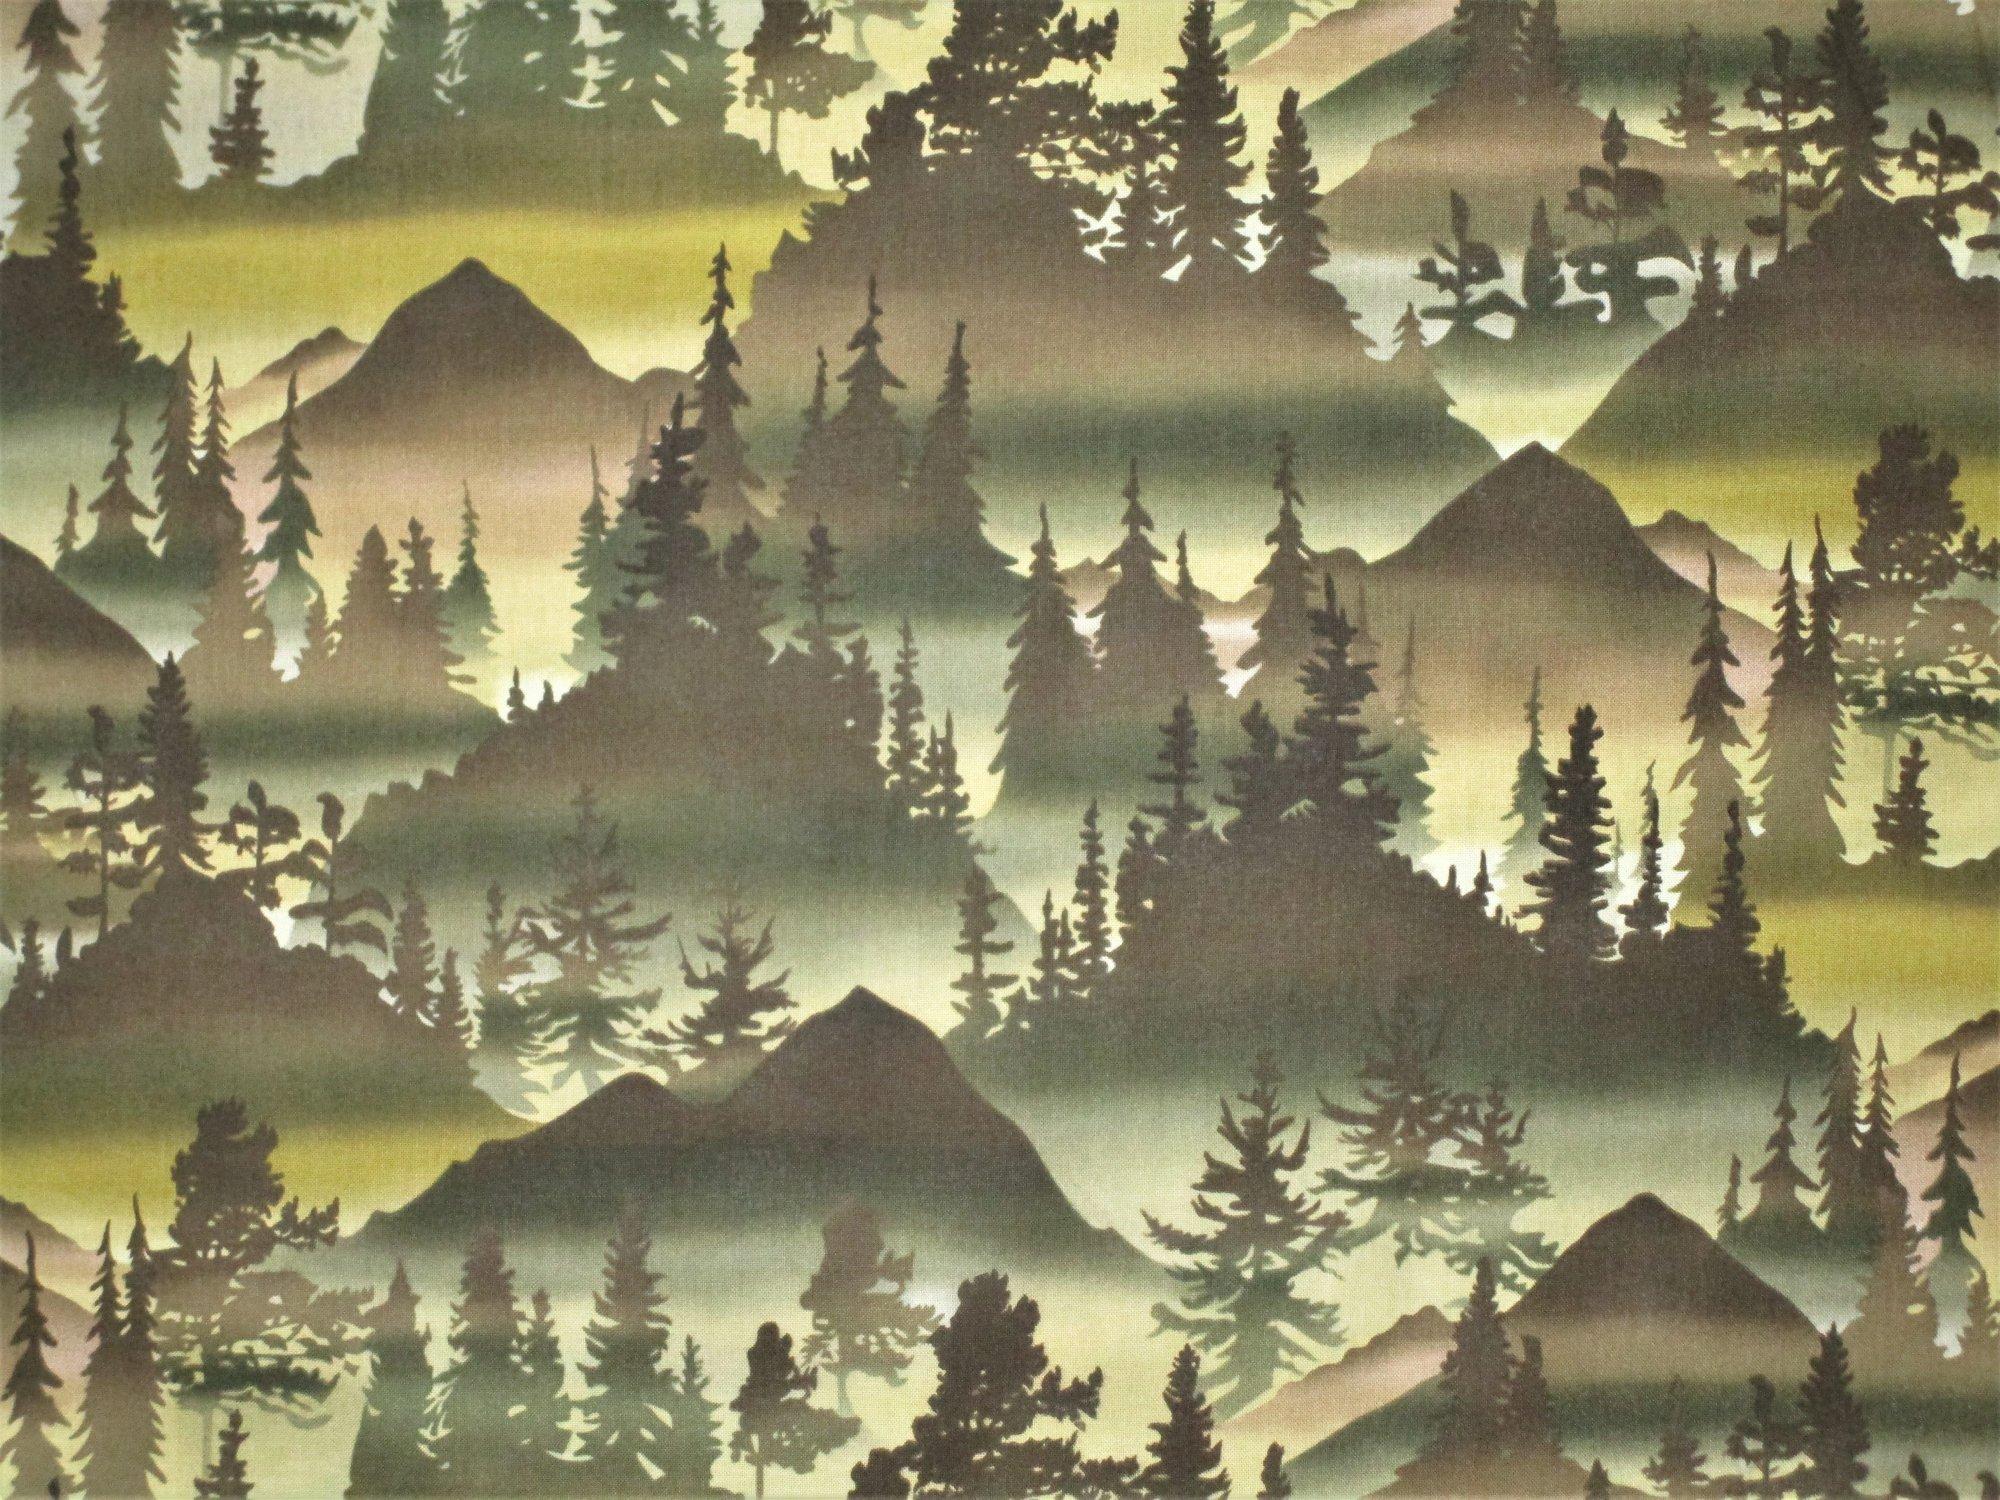 Pine Forest Silhouettes C5578 Oregano